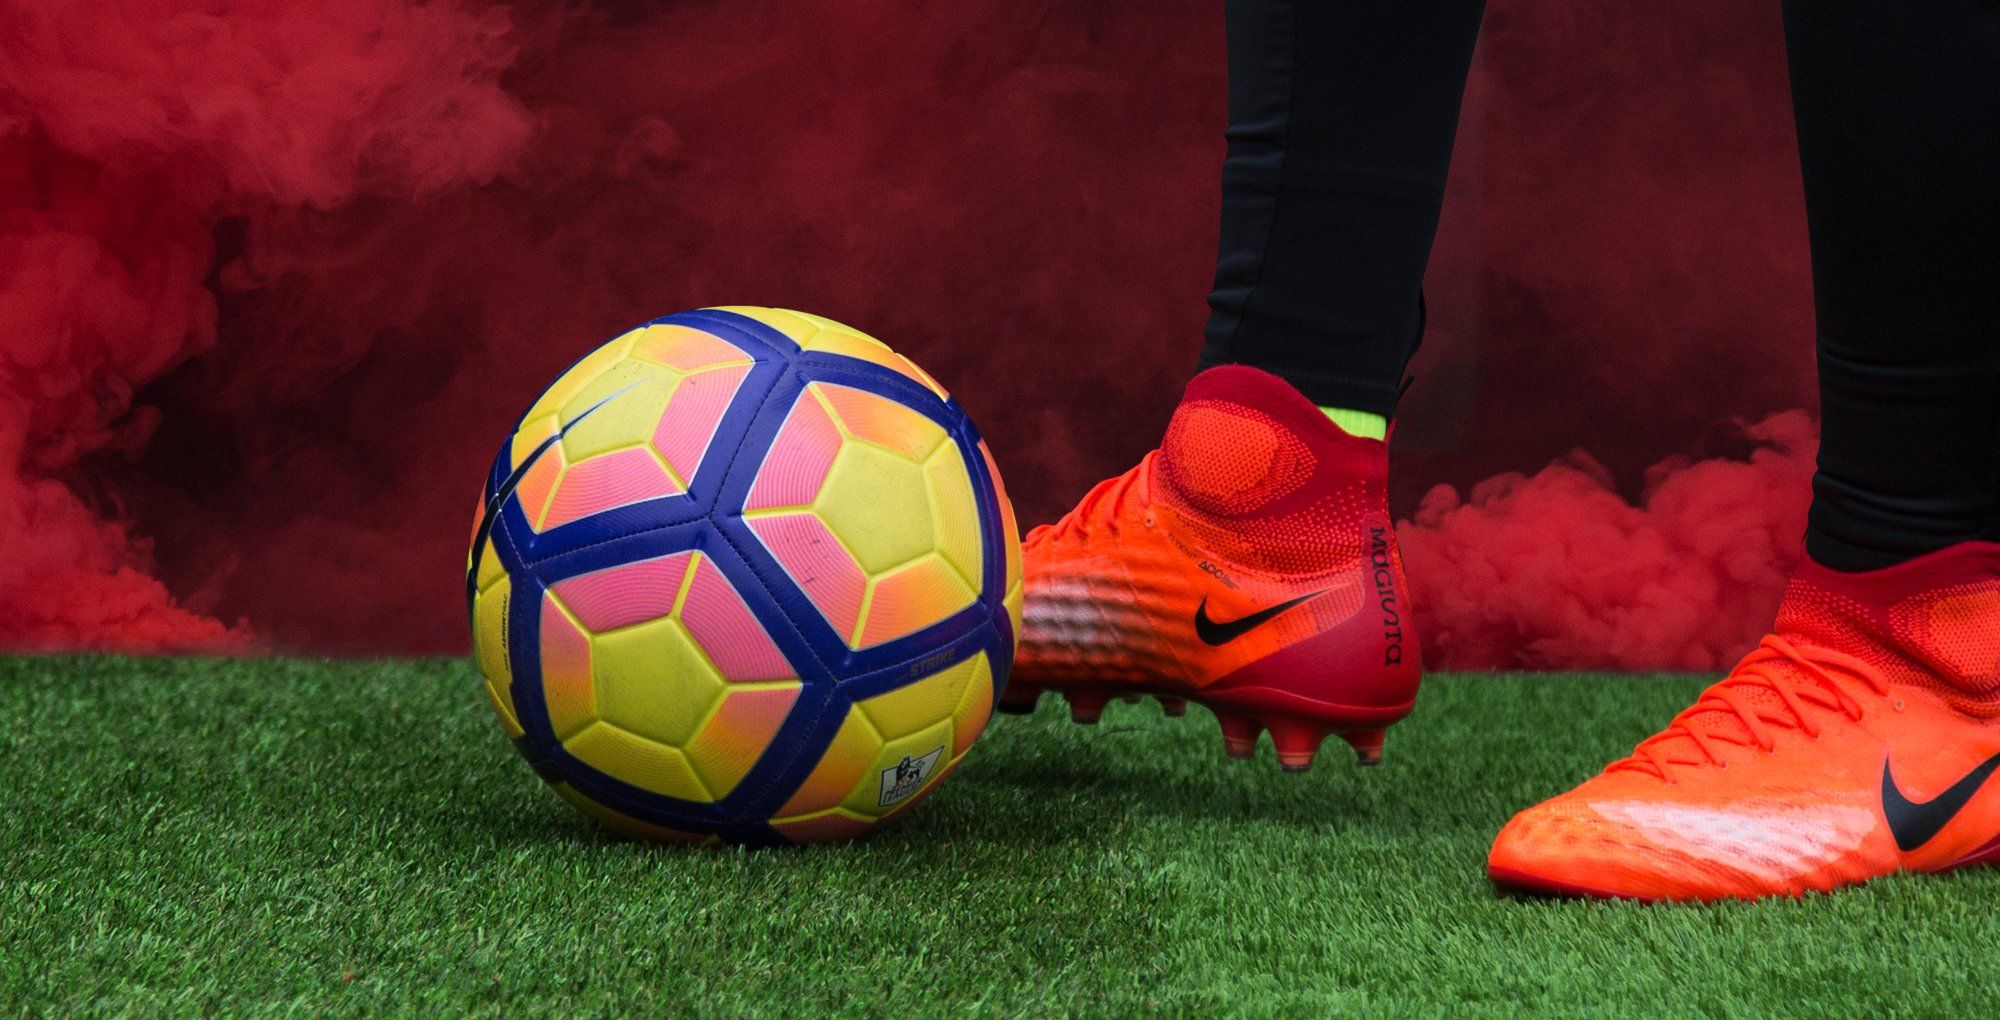 201817 Nike Magista Obra Ag r Turquoise Blau Rollomall